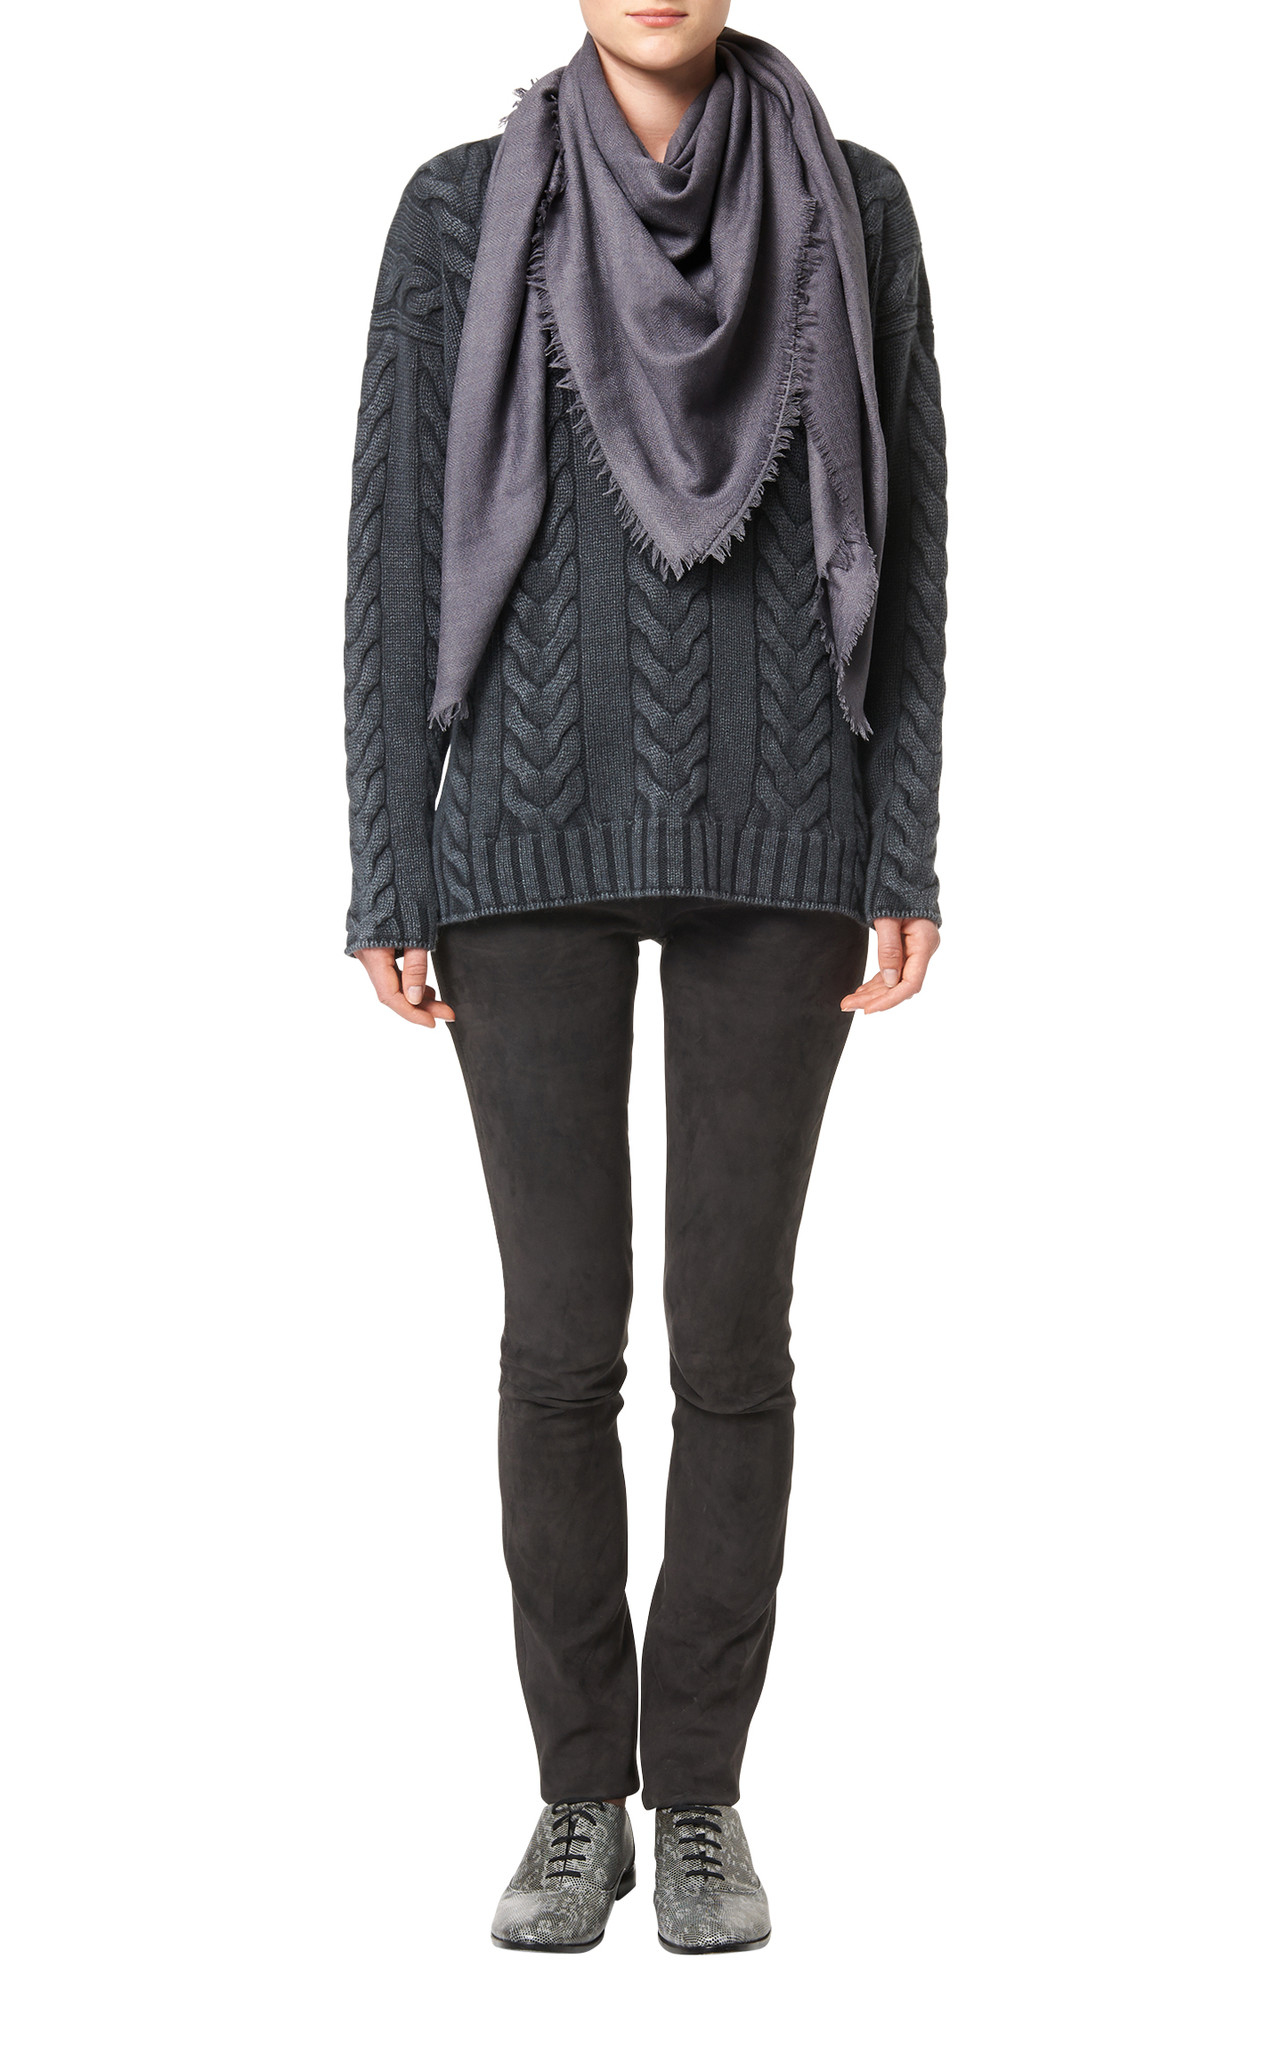 iris von arnim scarf herringbone in gray slate lyst. Black Bedroom Furniture Sets. Home Design Ideas